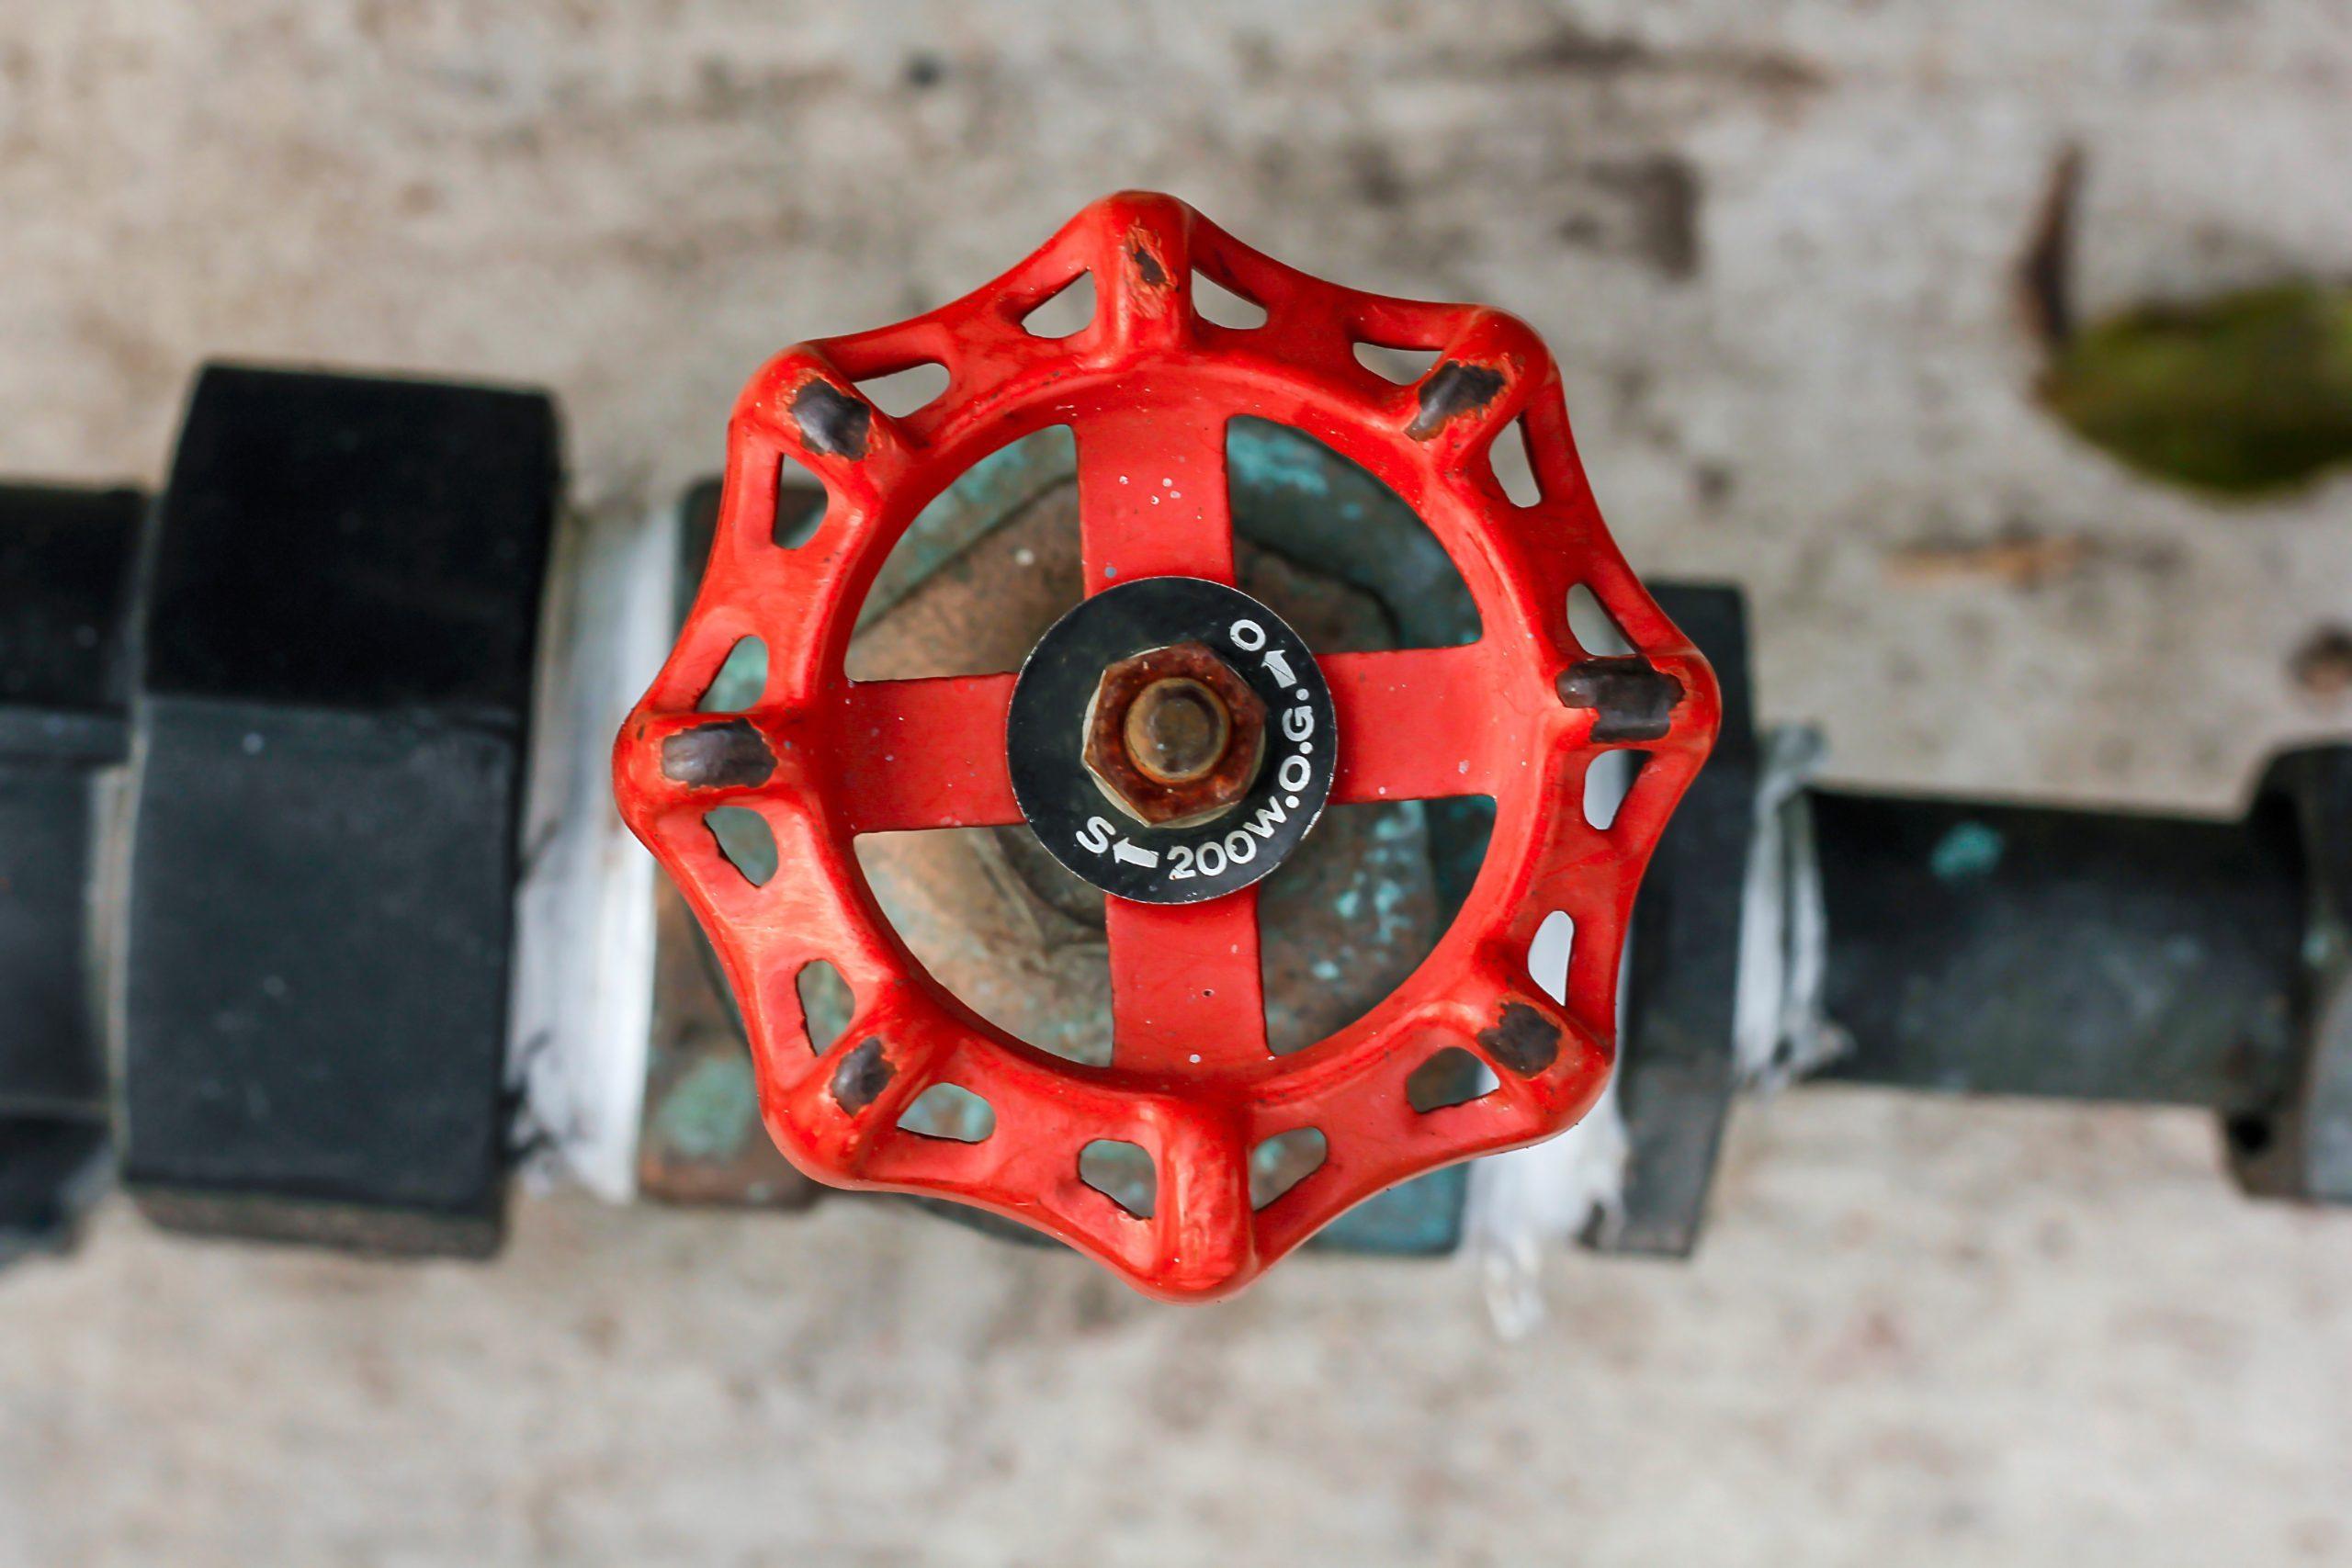 Water shut off valve Red on the floor